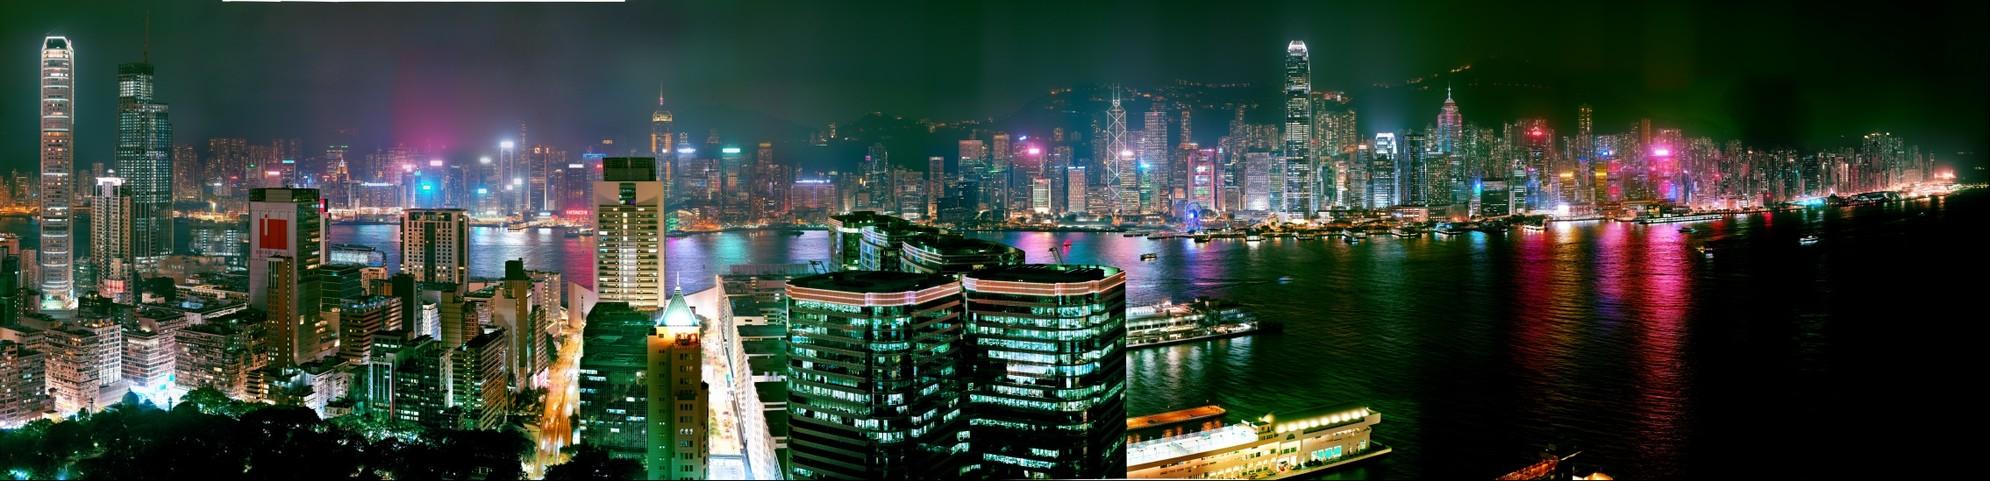 Hong Kong in 5 Gigapixel